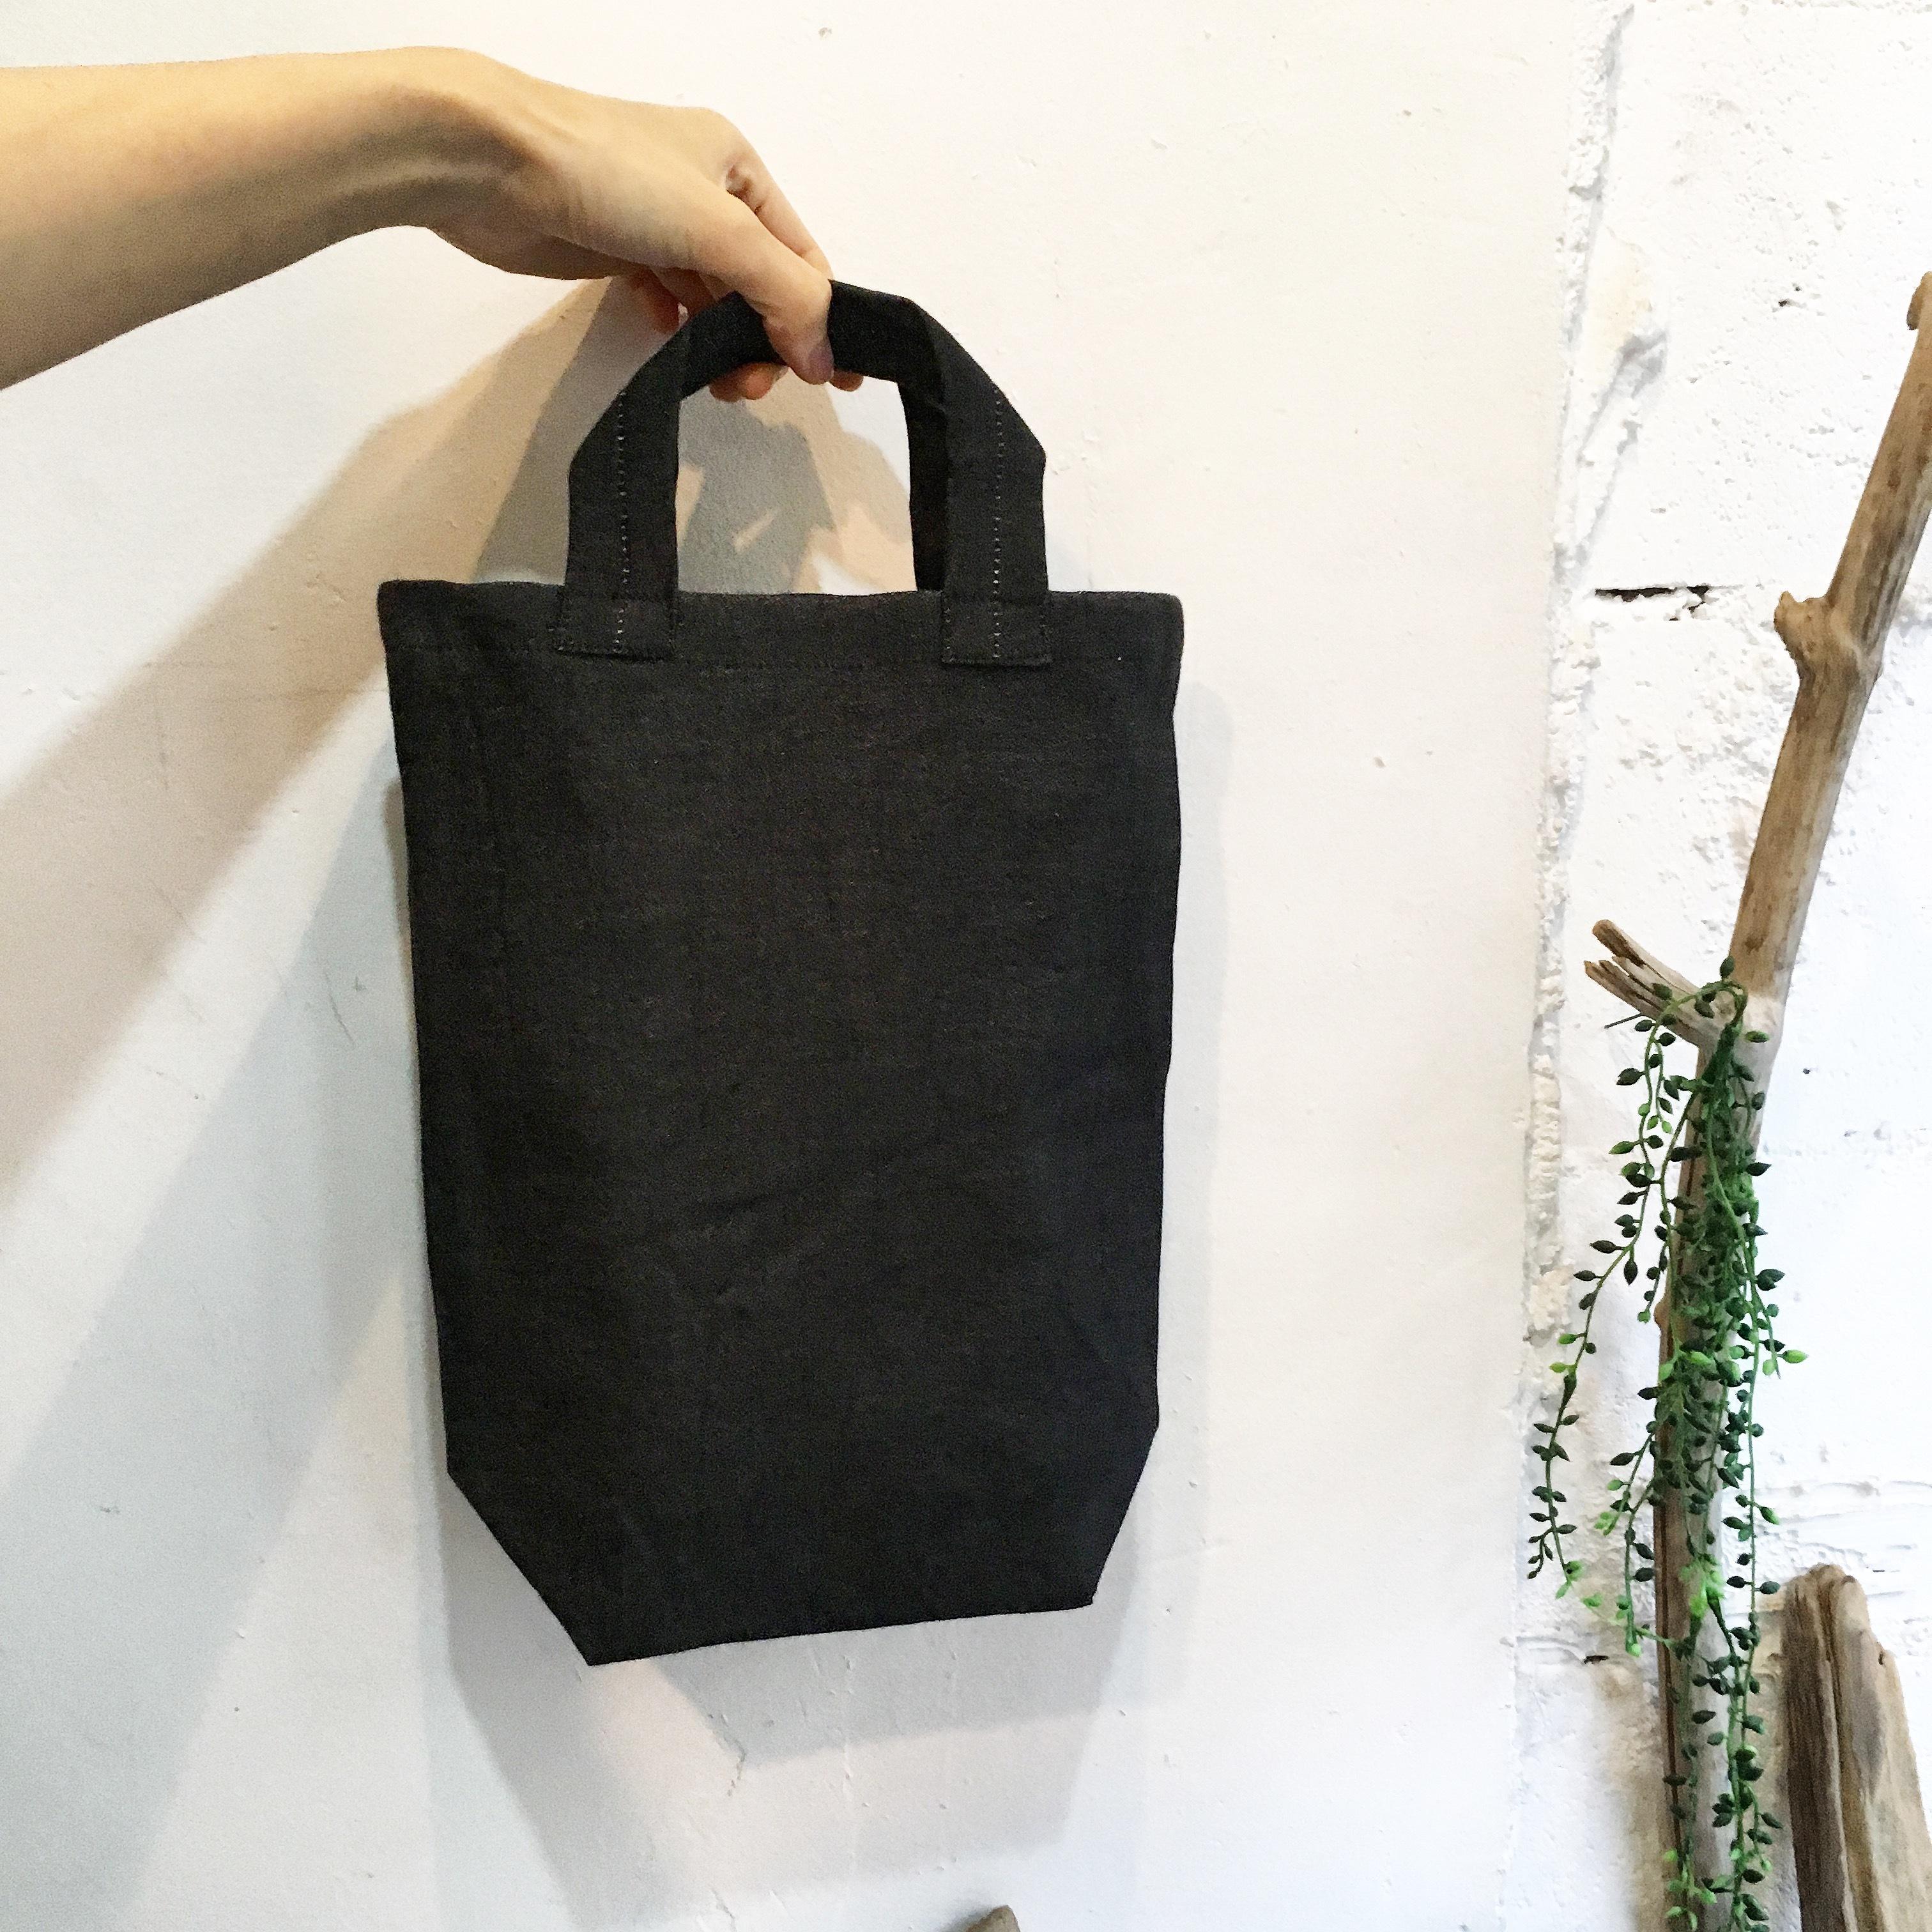 【maco】トートbag Sサイズ(denim)